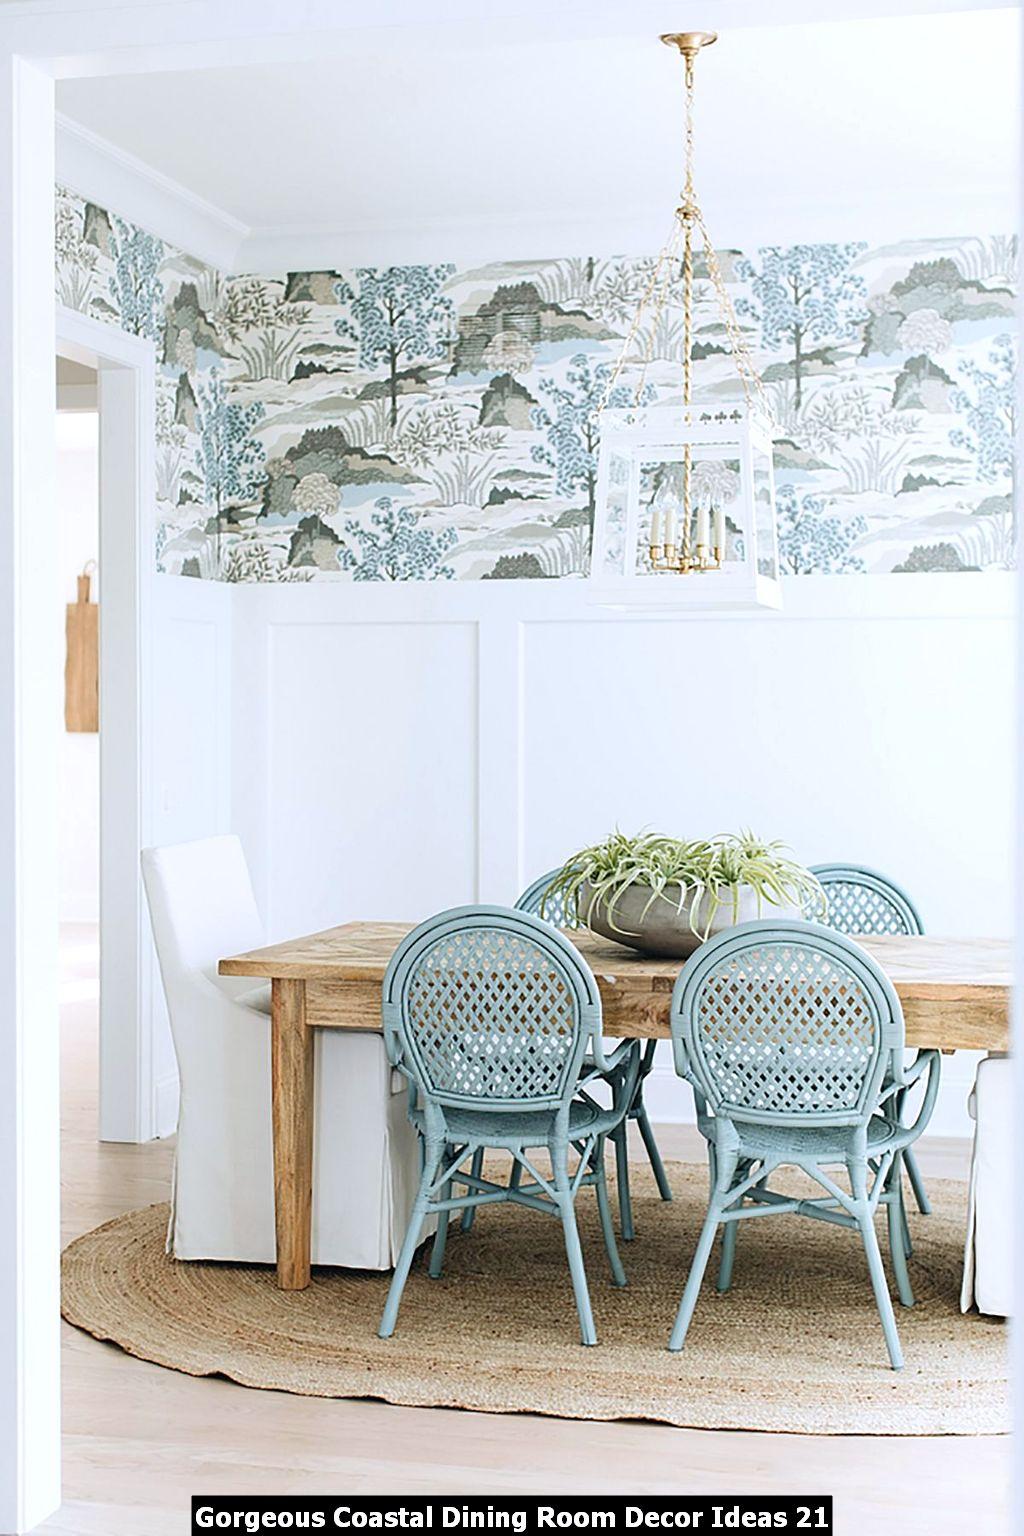 Gorgeous Coastal Dining Room Decor Ideas 21